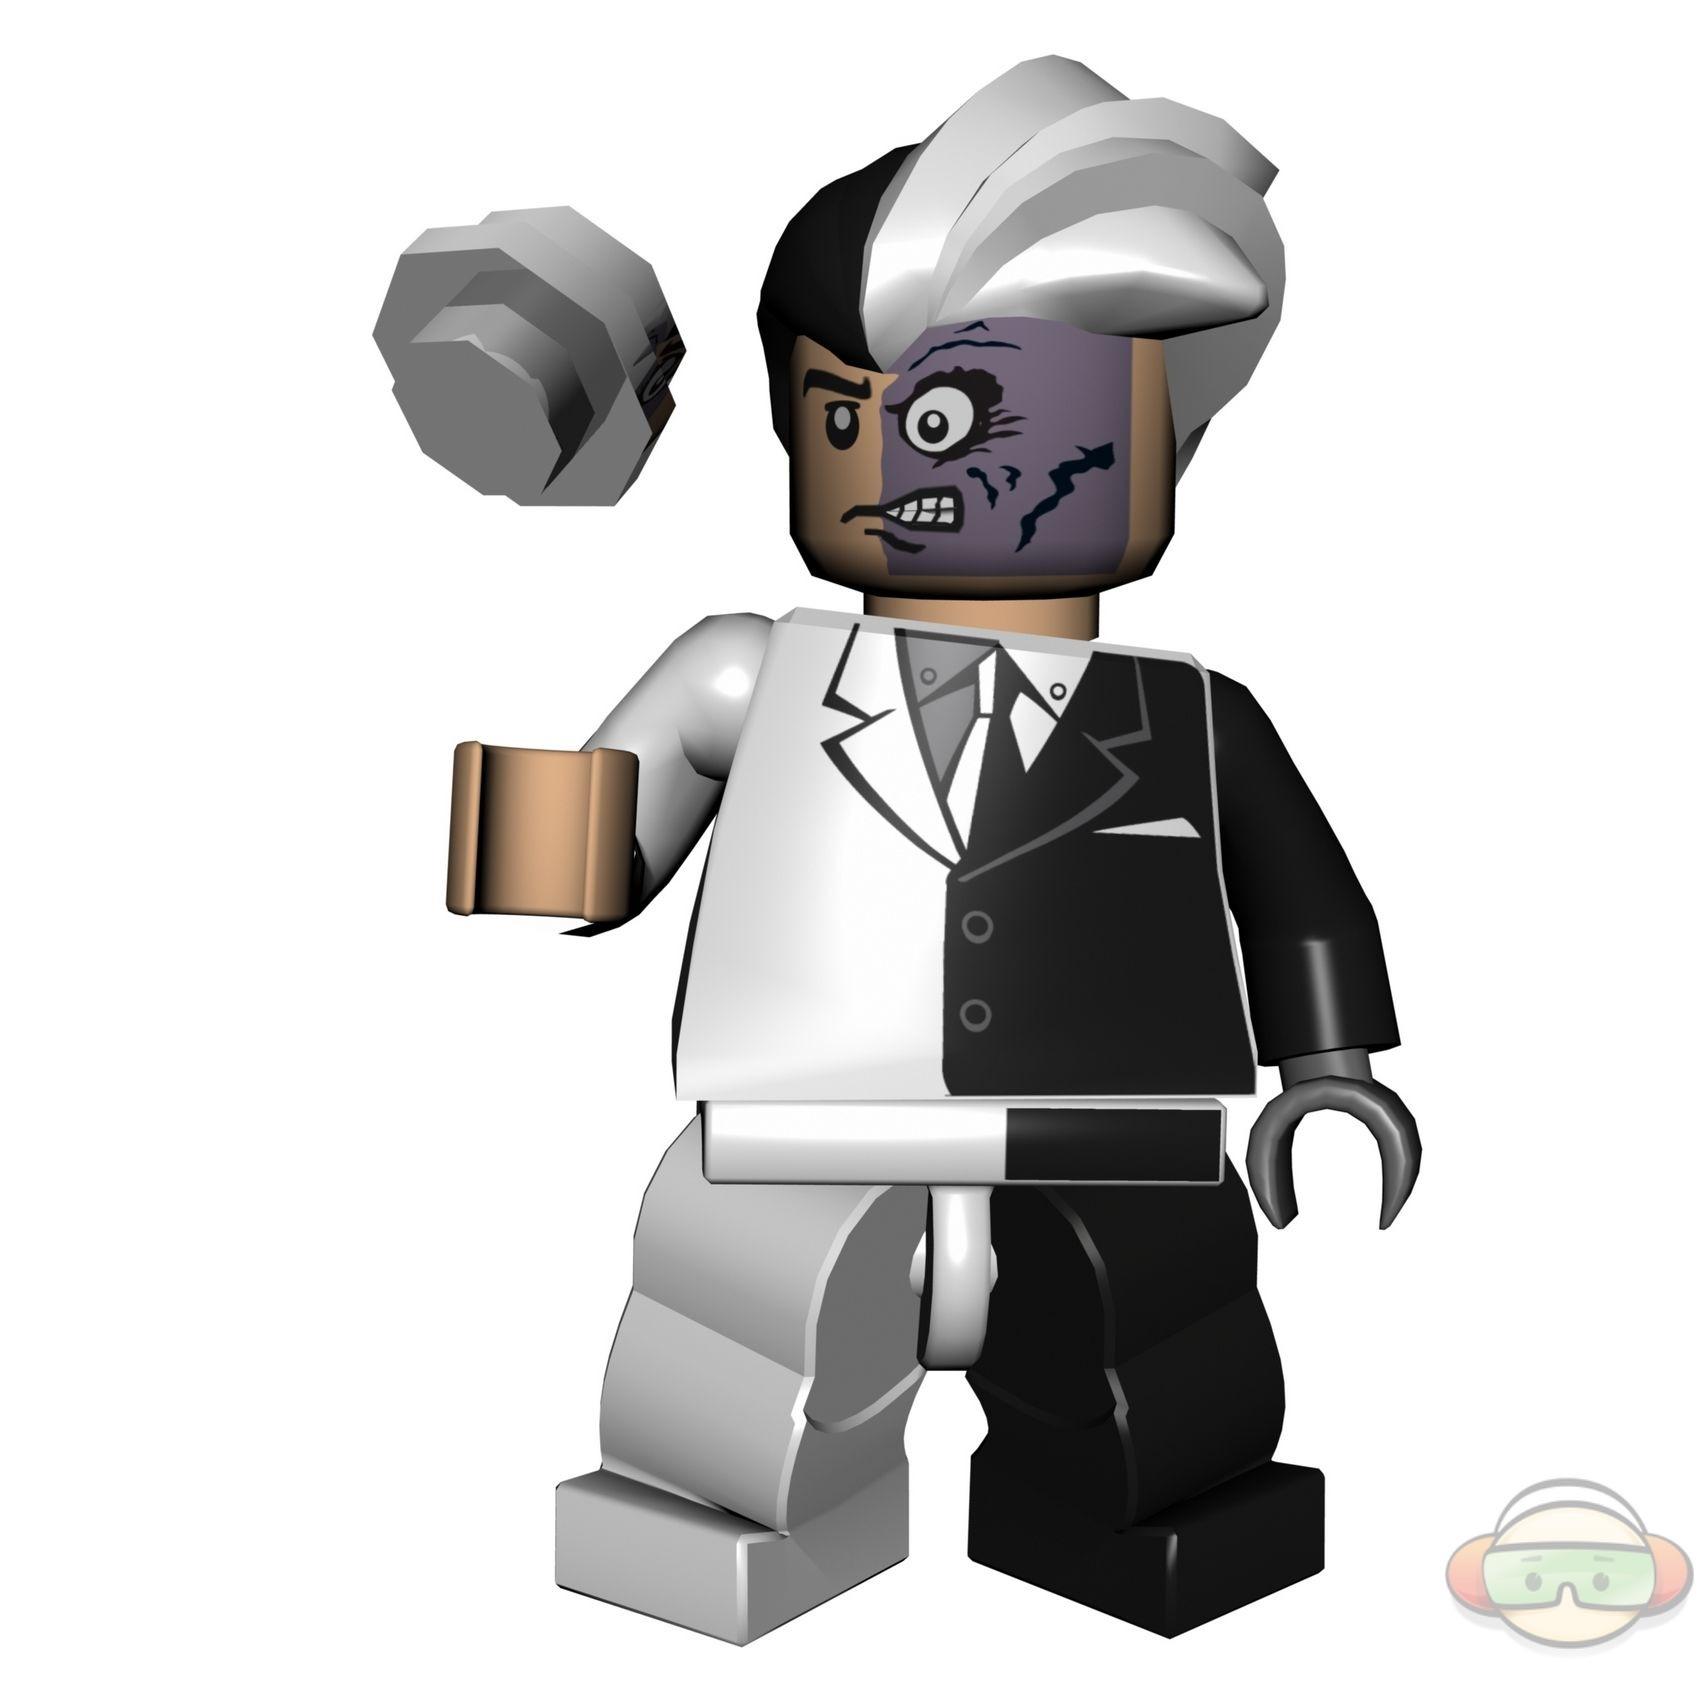 LEGO Batman: The Videogame | Technogog